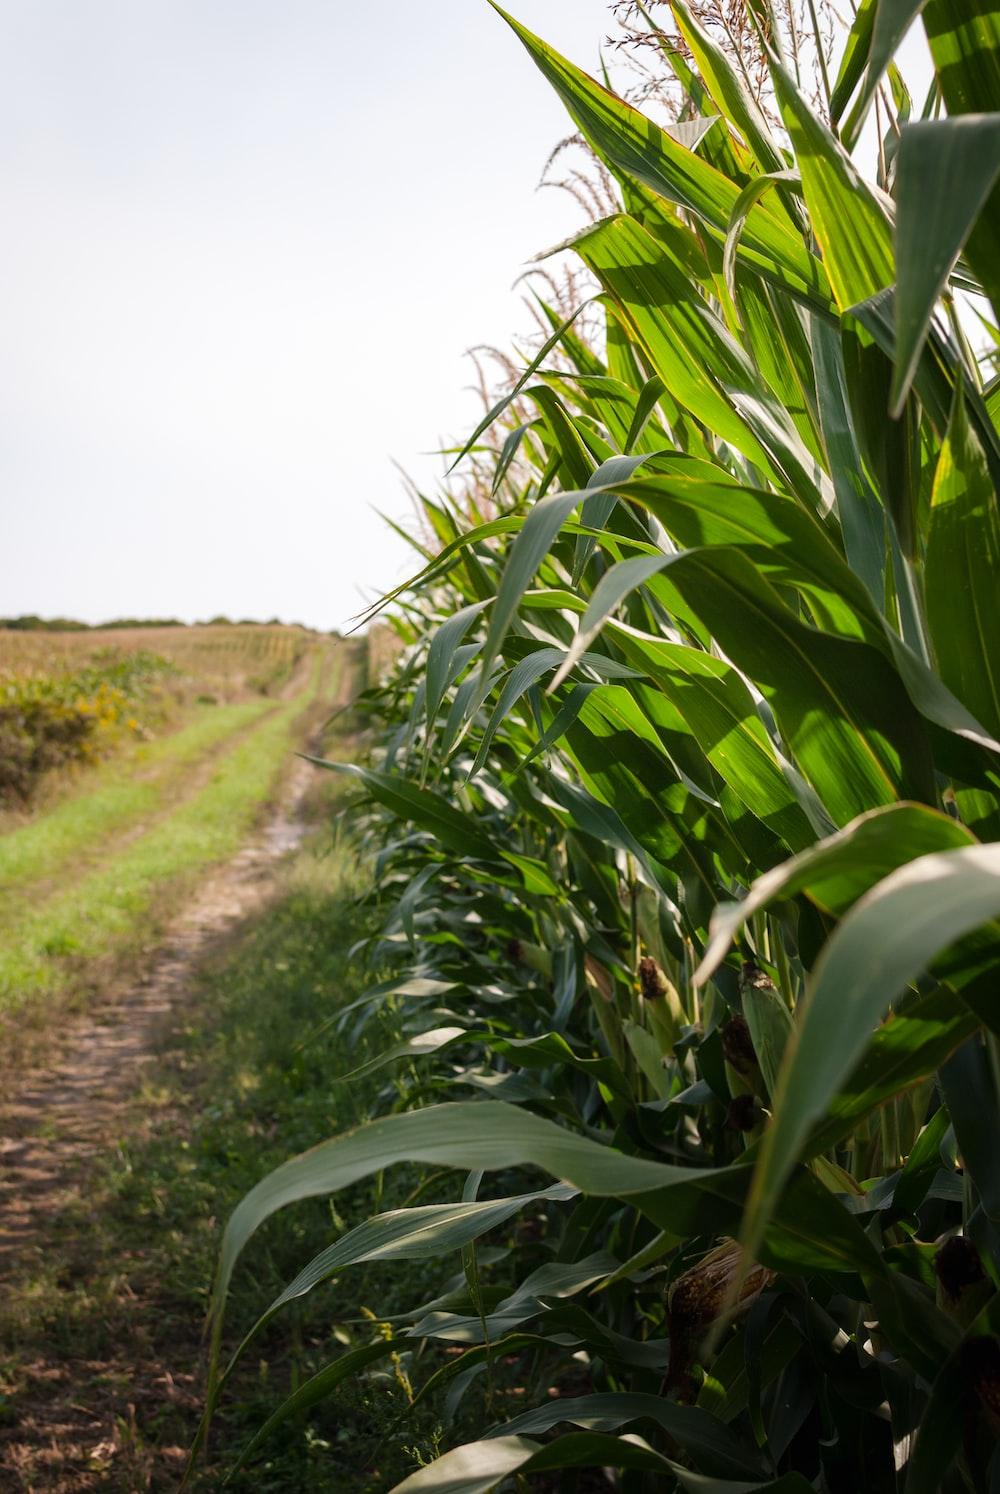 green corn field during daytime